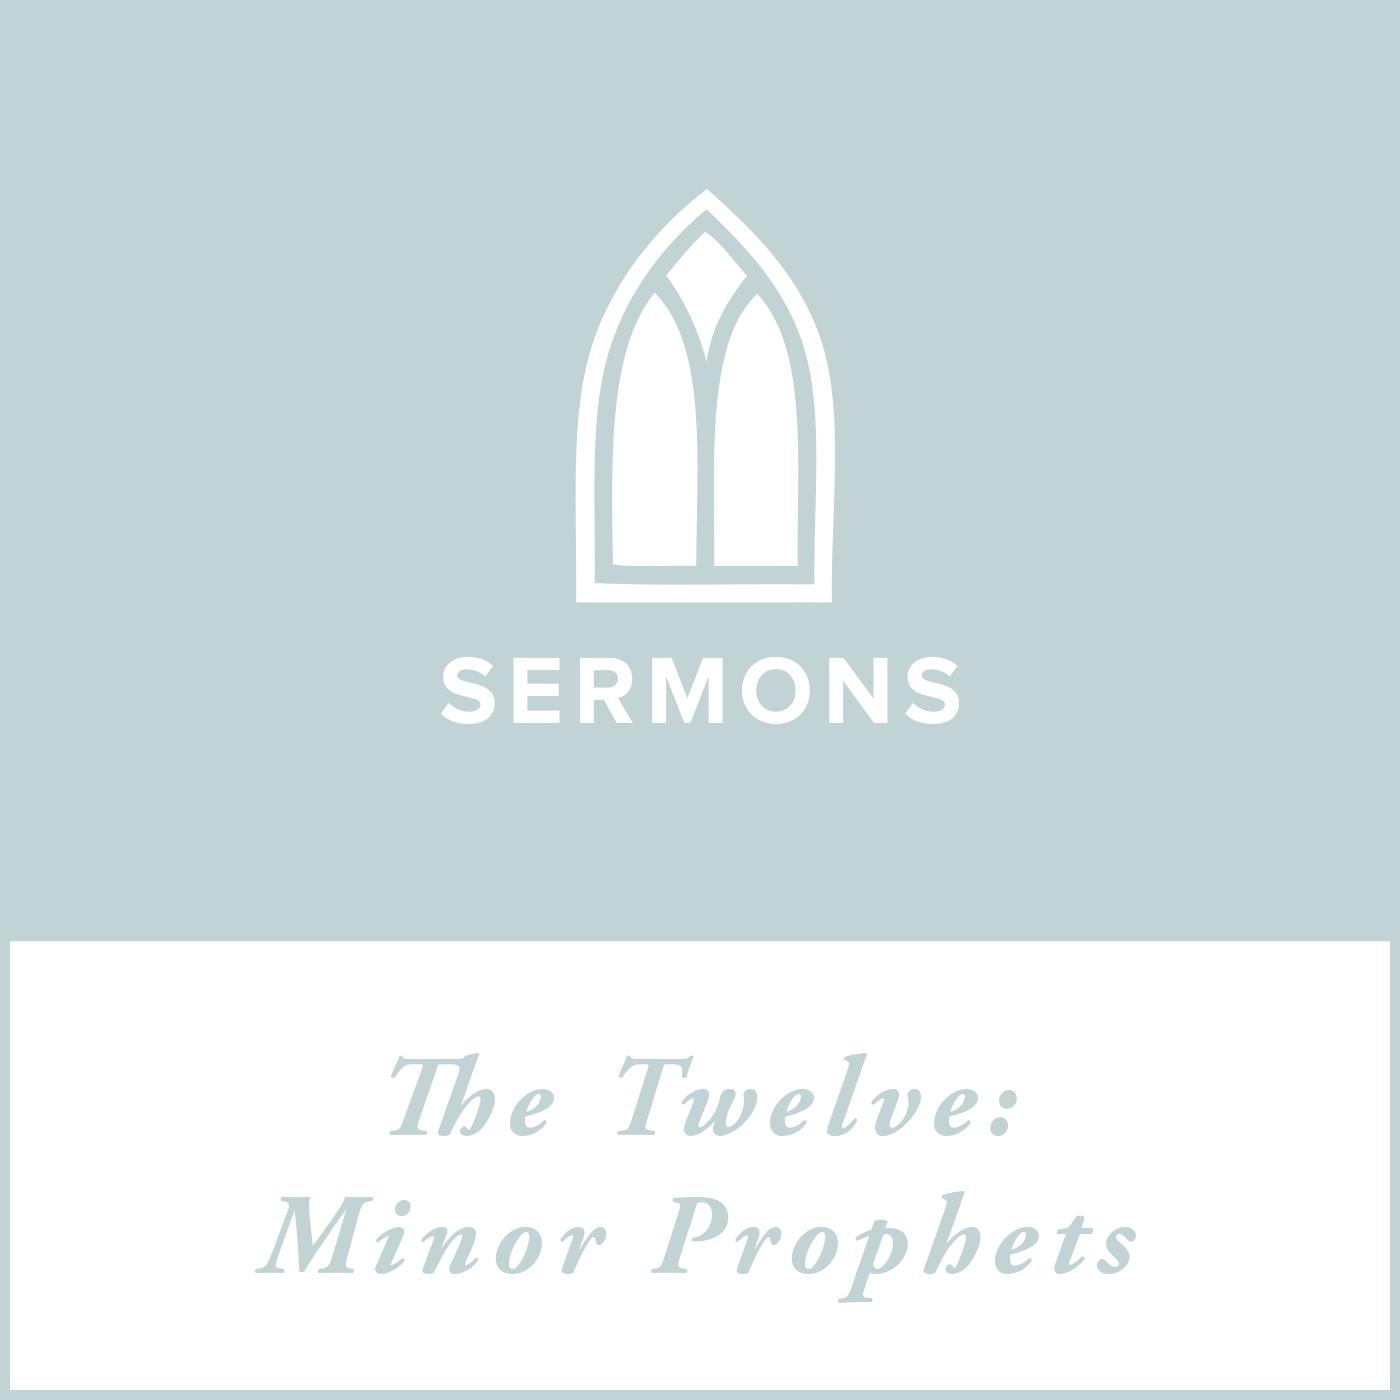 Minor-Prophets-tile.png